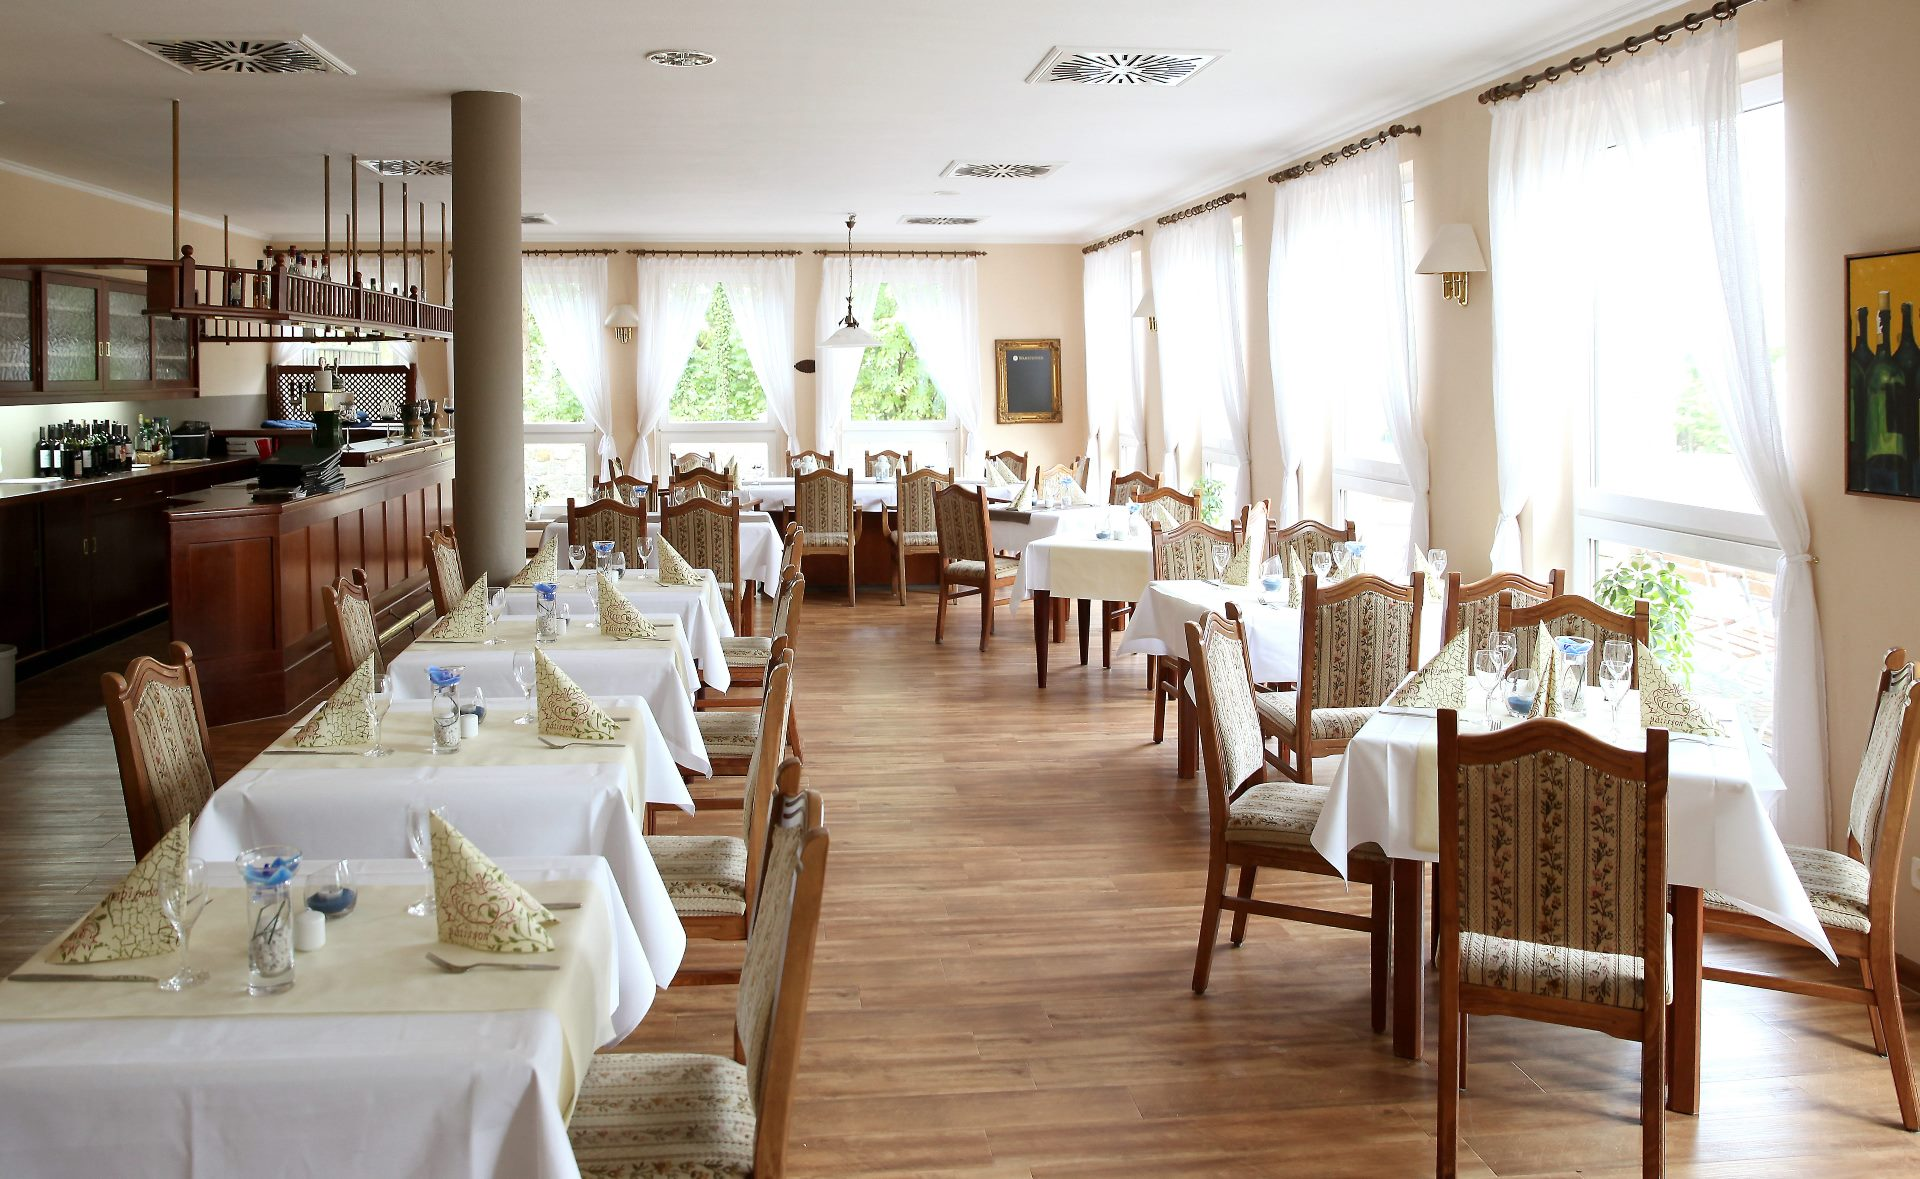 Sterne Hotel Mecklenburgische Seenplatte